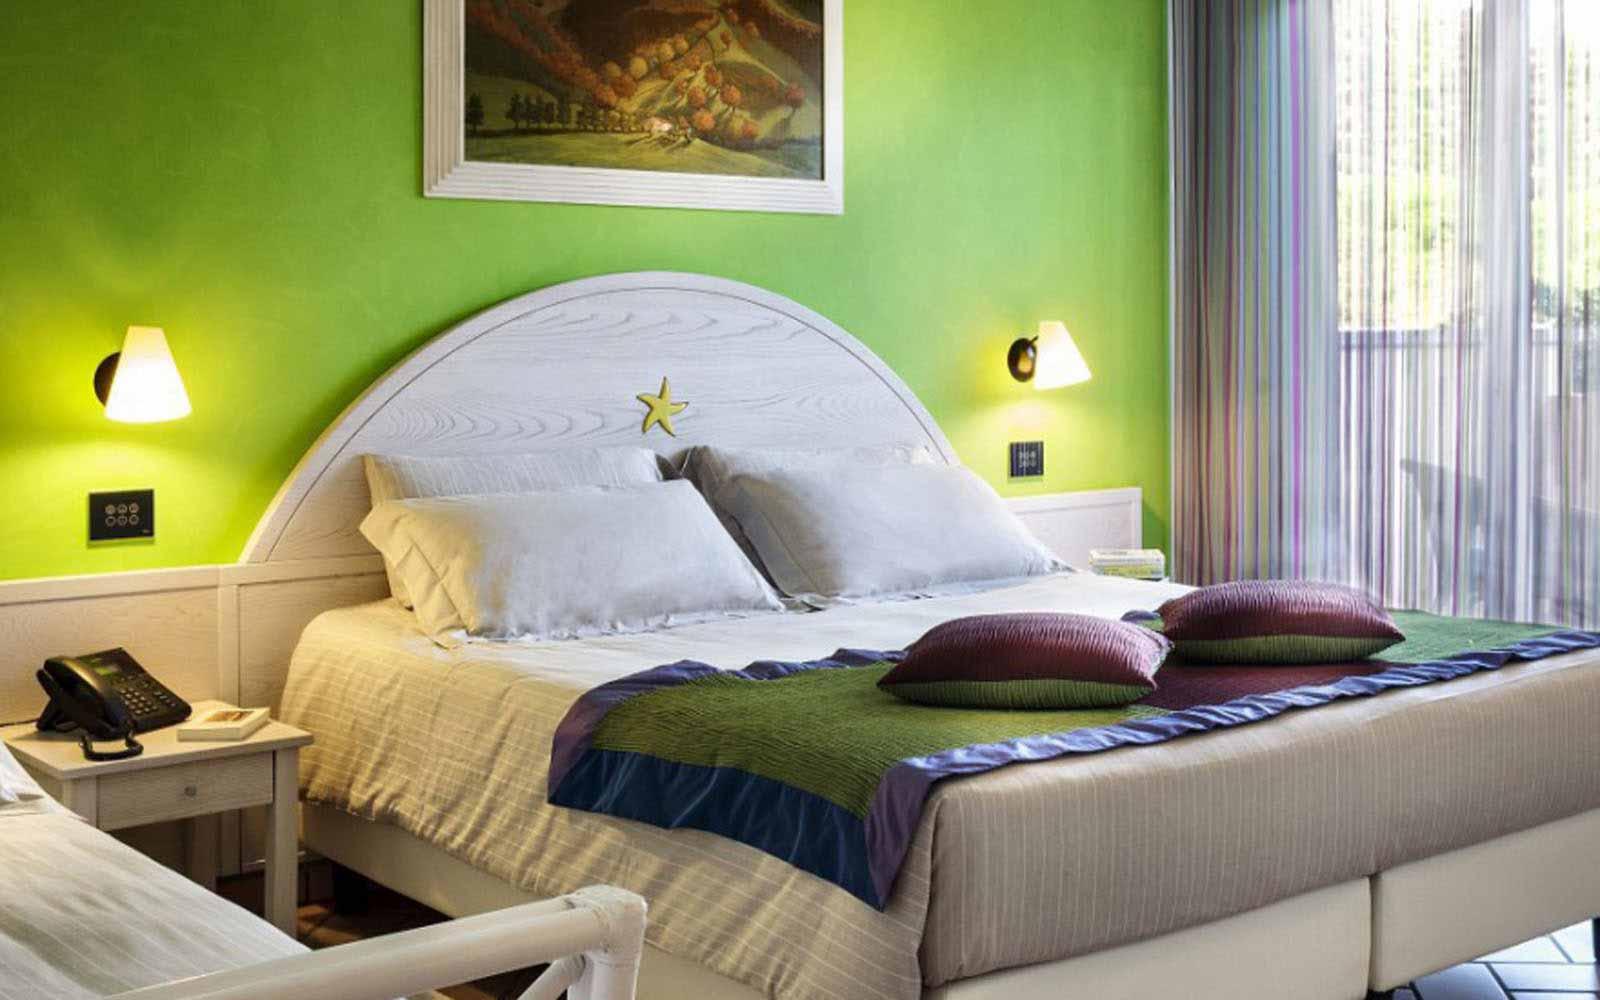 Classic Room at the Hotel Stella Maris